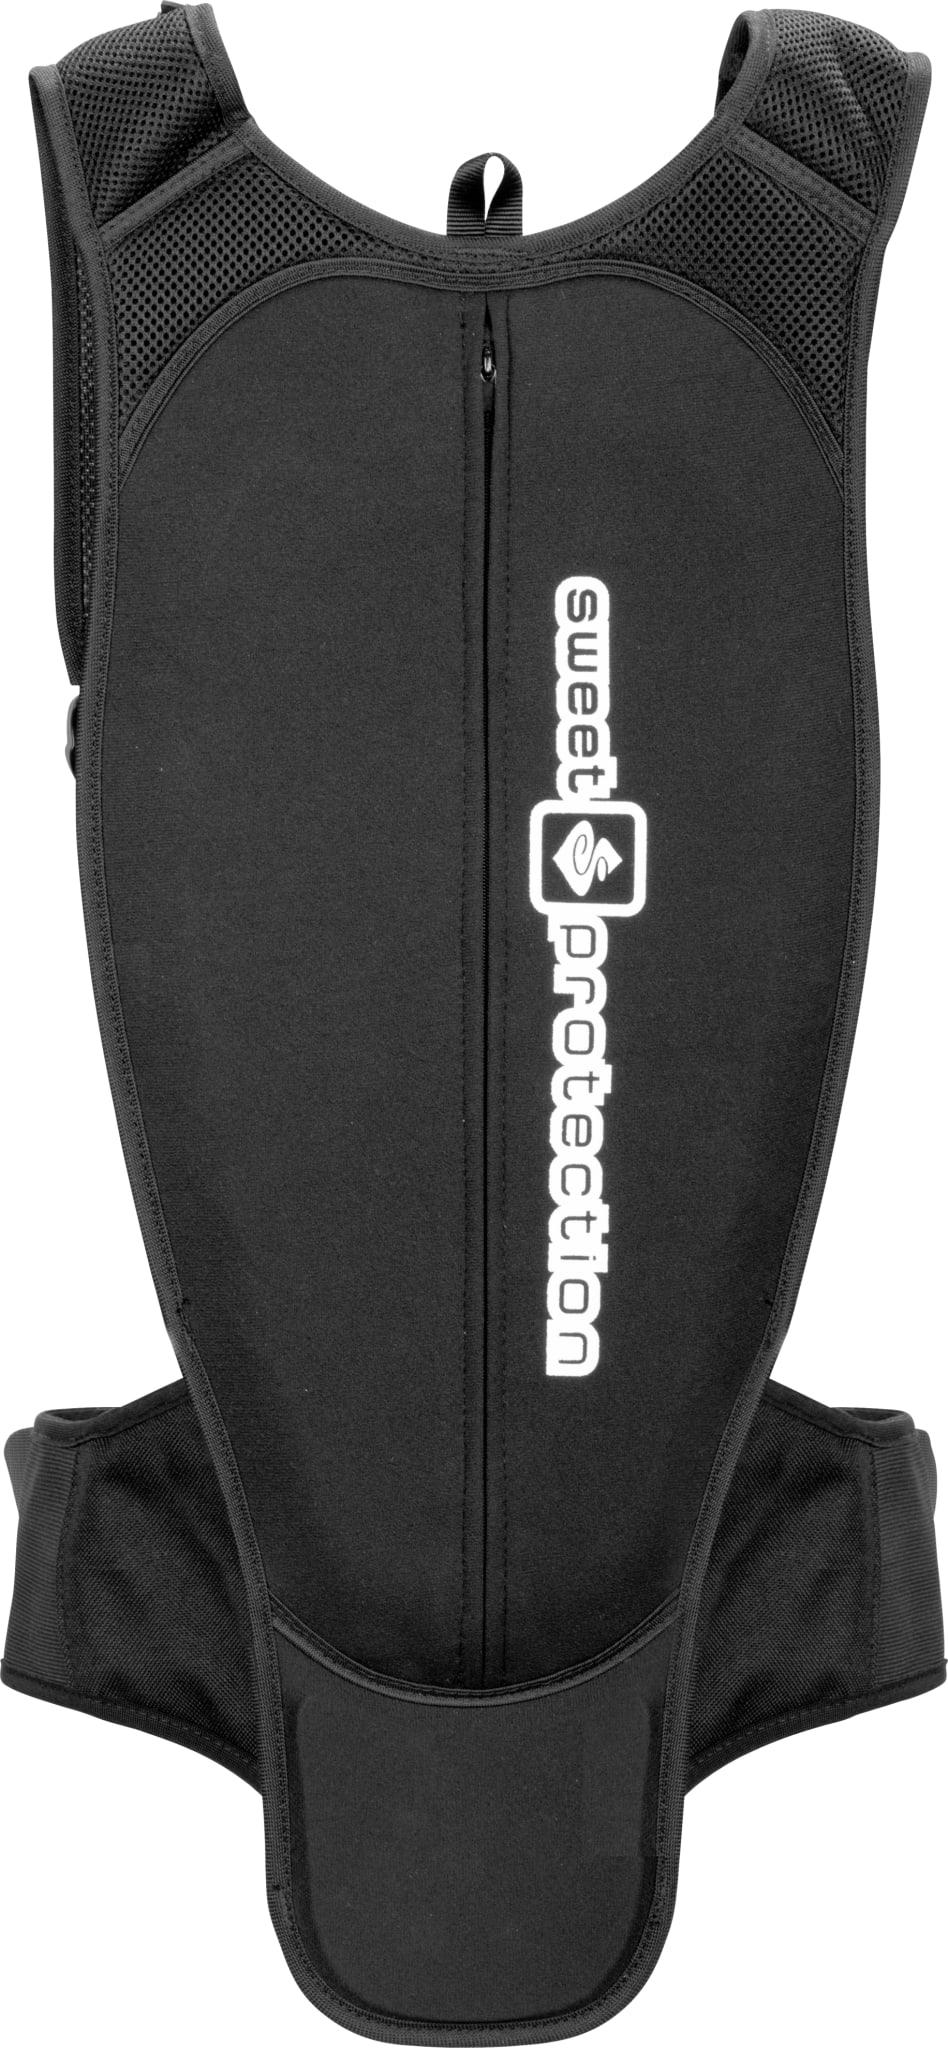 Soft ryggplate for god beskyttelse og maksimal komfort